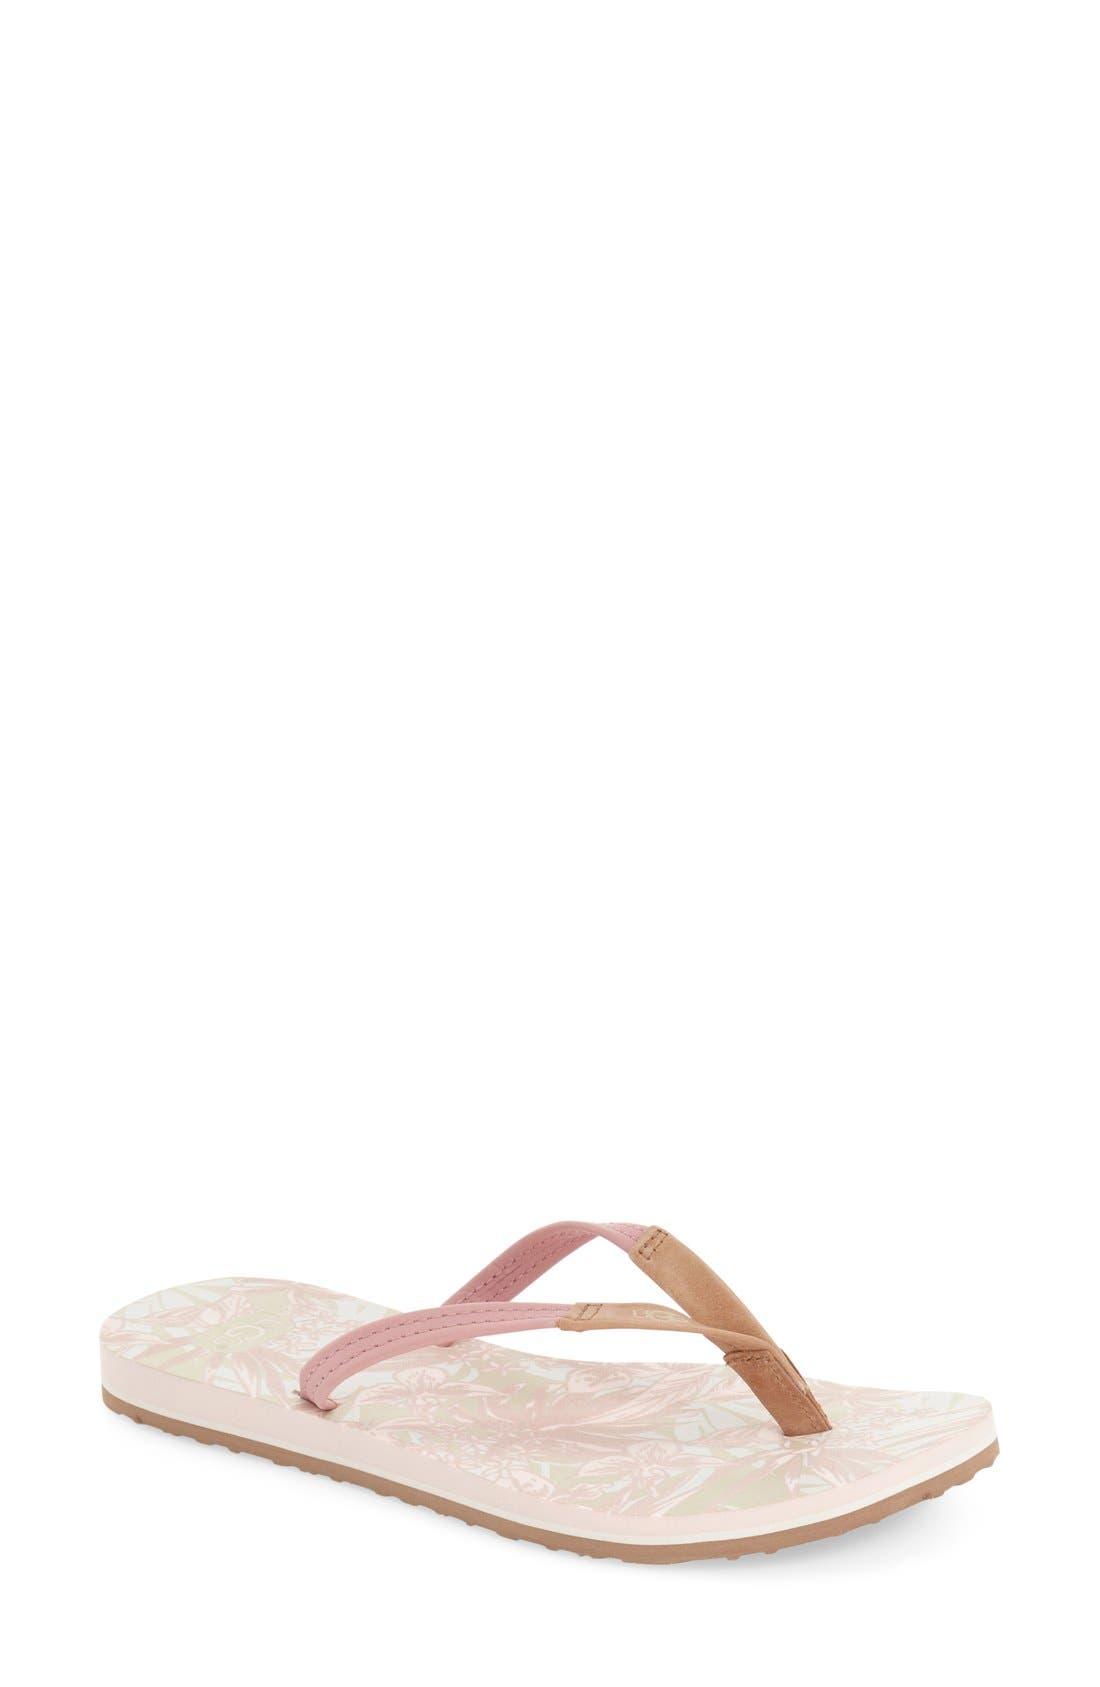 Main Image - UGG® 'Magnolia Island' Flip Flop (Women)